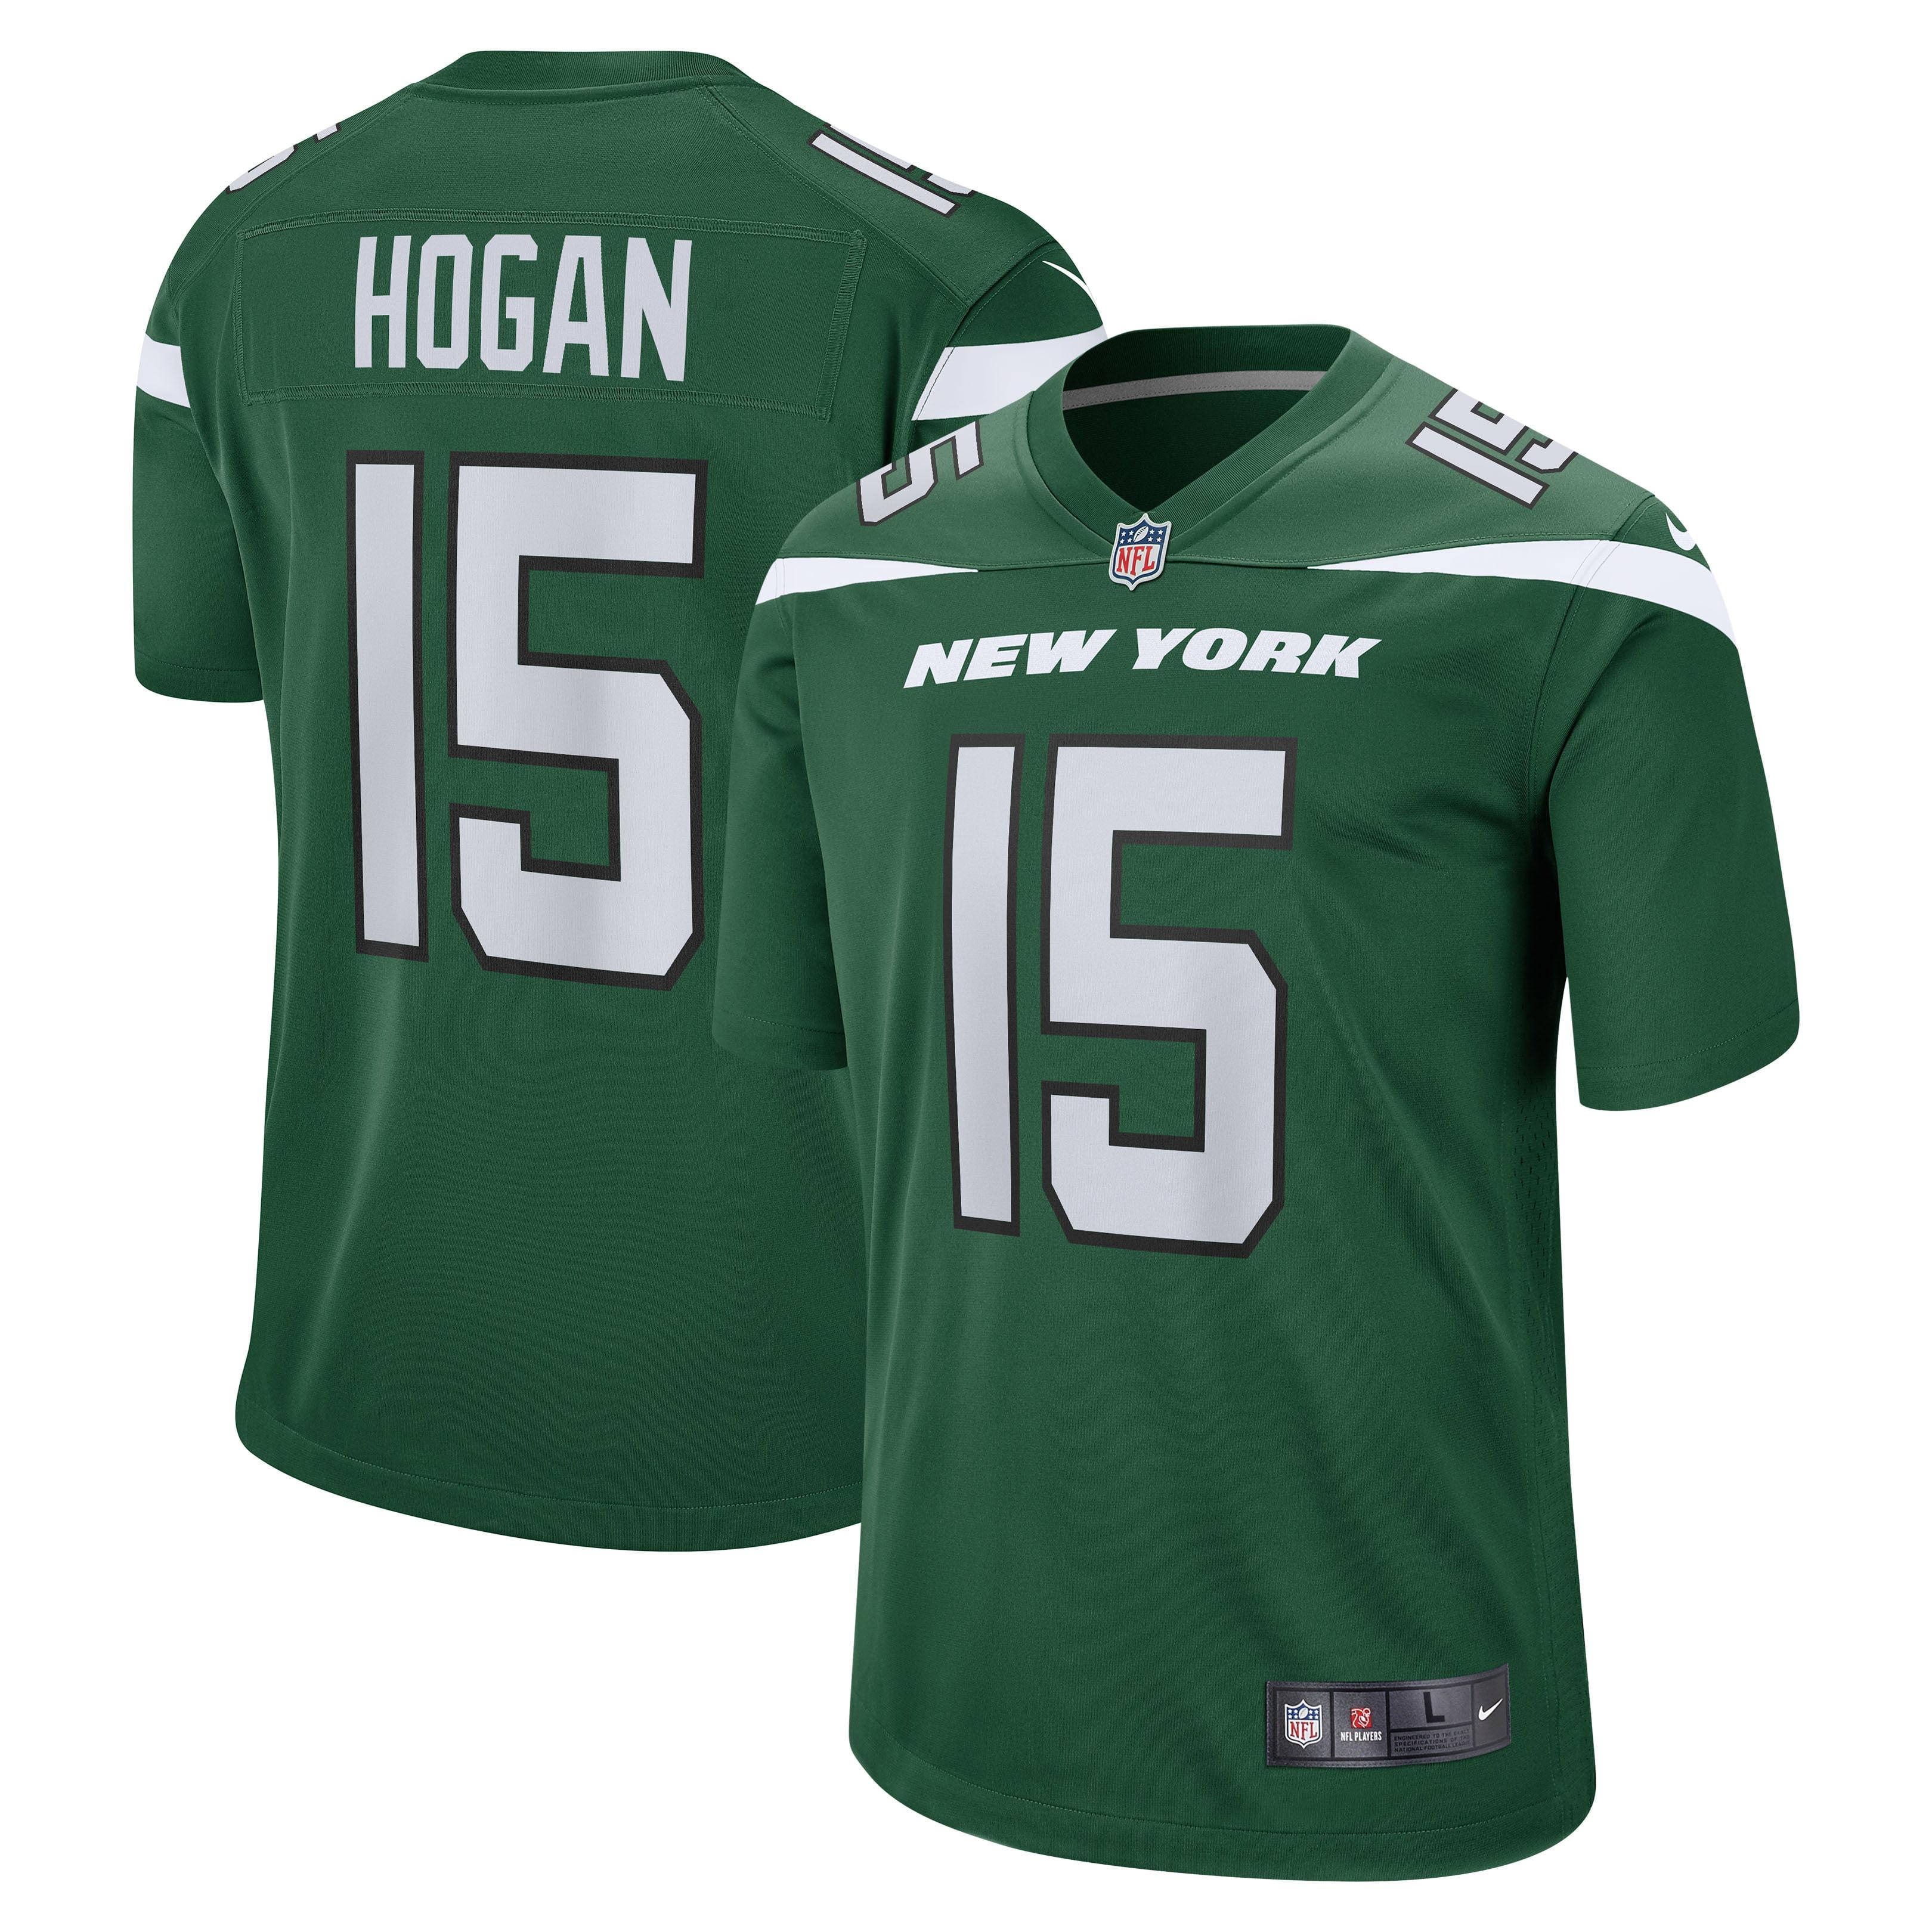 Chris Hogan New York Jets Nike Team Game Jersey - Gotham Green - Walmart.com